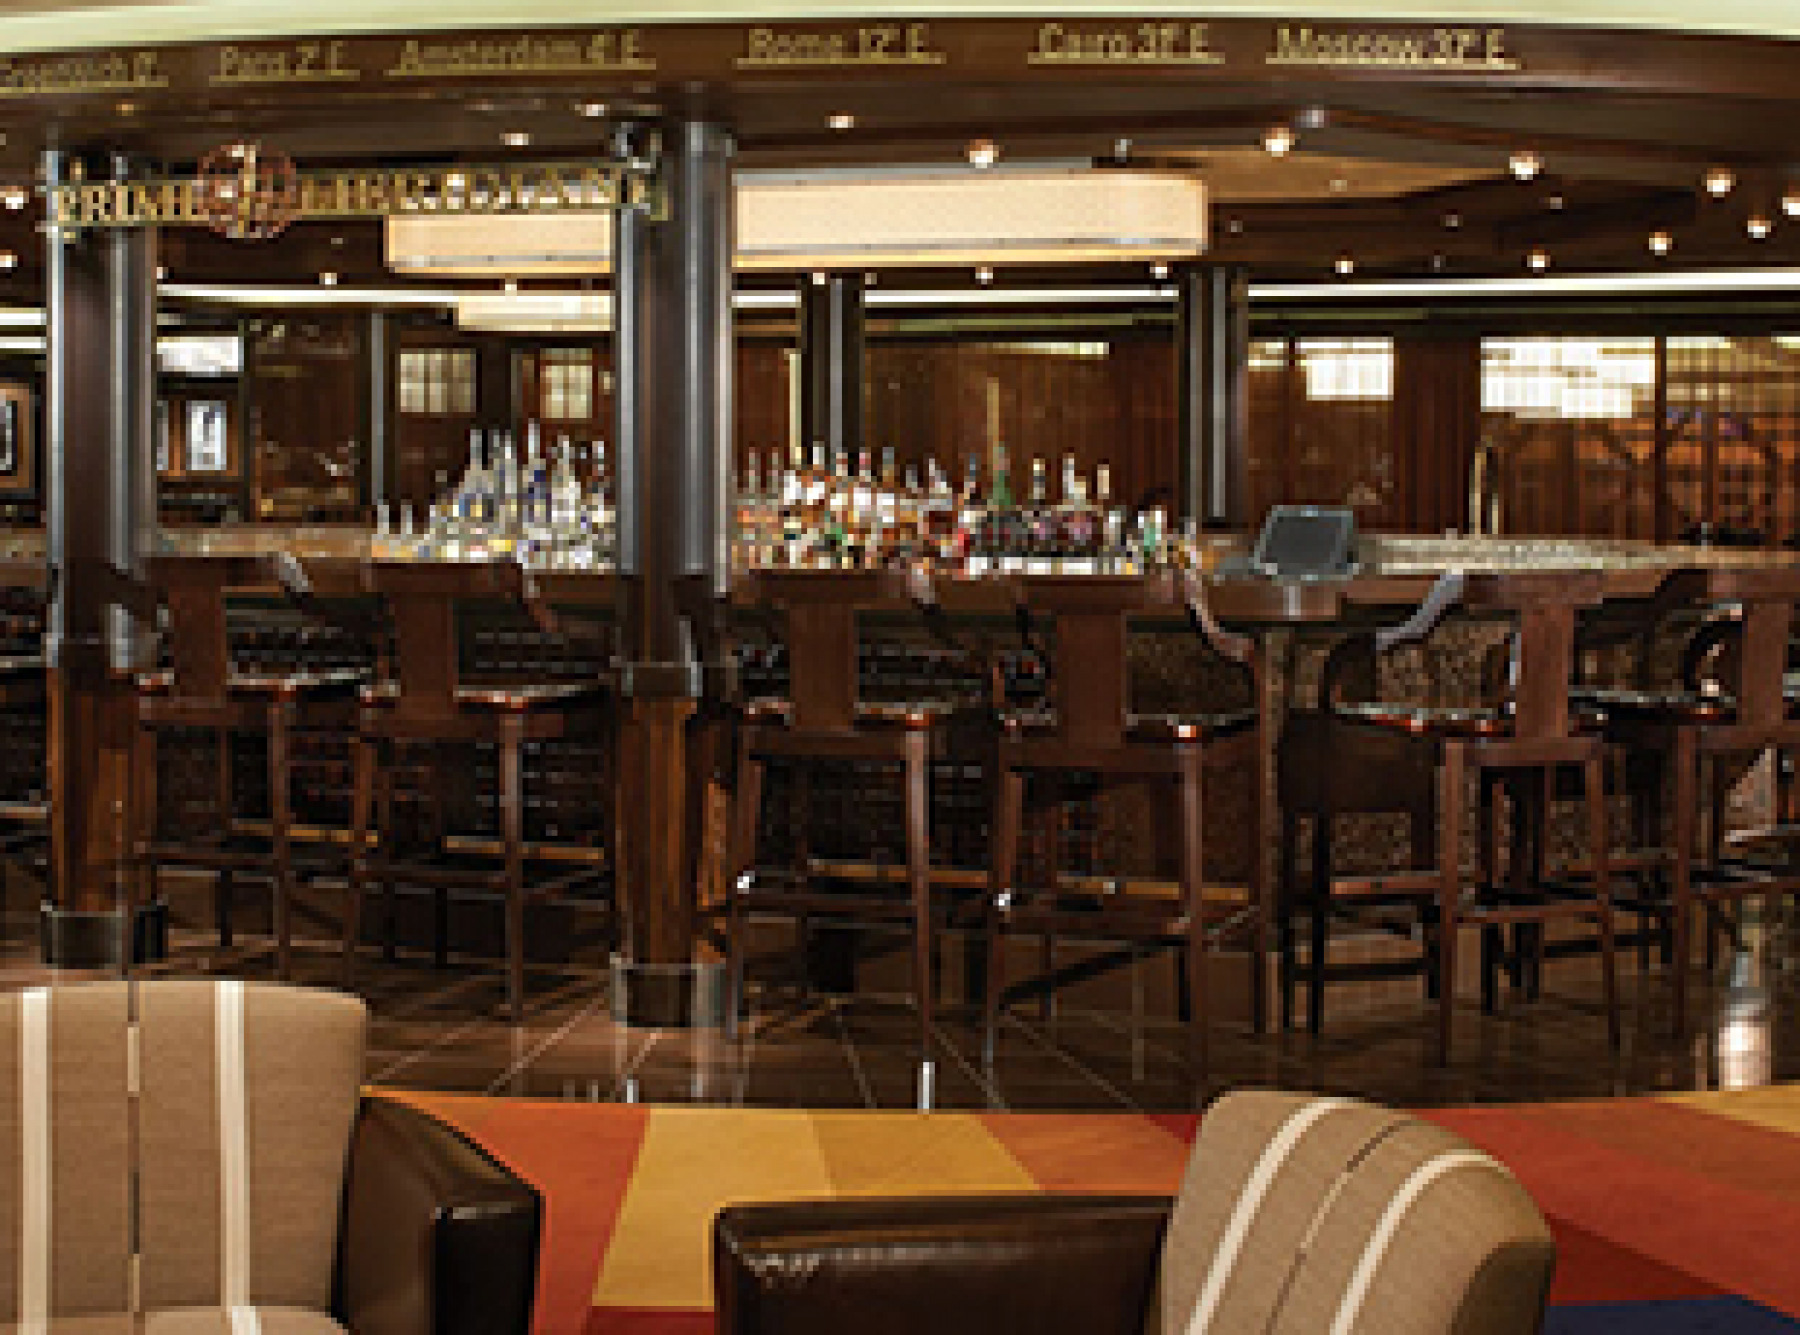 Norwegian Cruise Line Norwegian Breakaway Interior Prime Meridian Bar.jpg